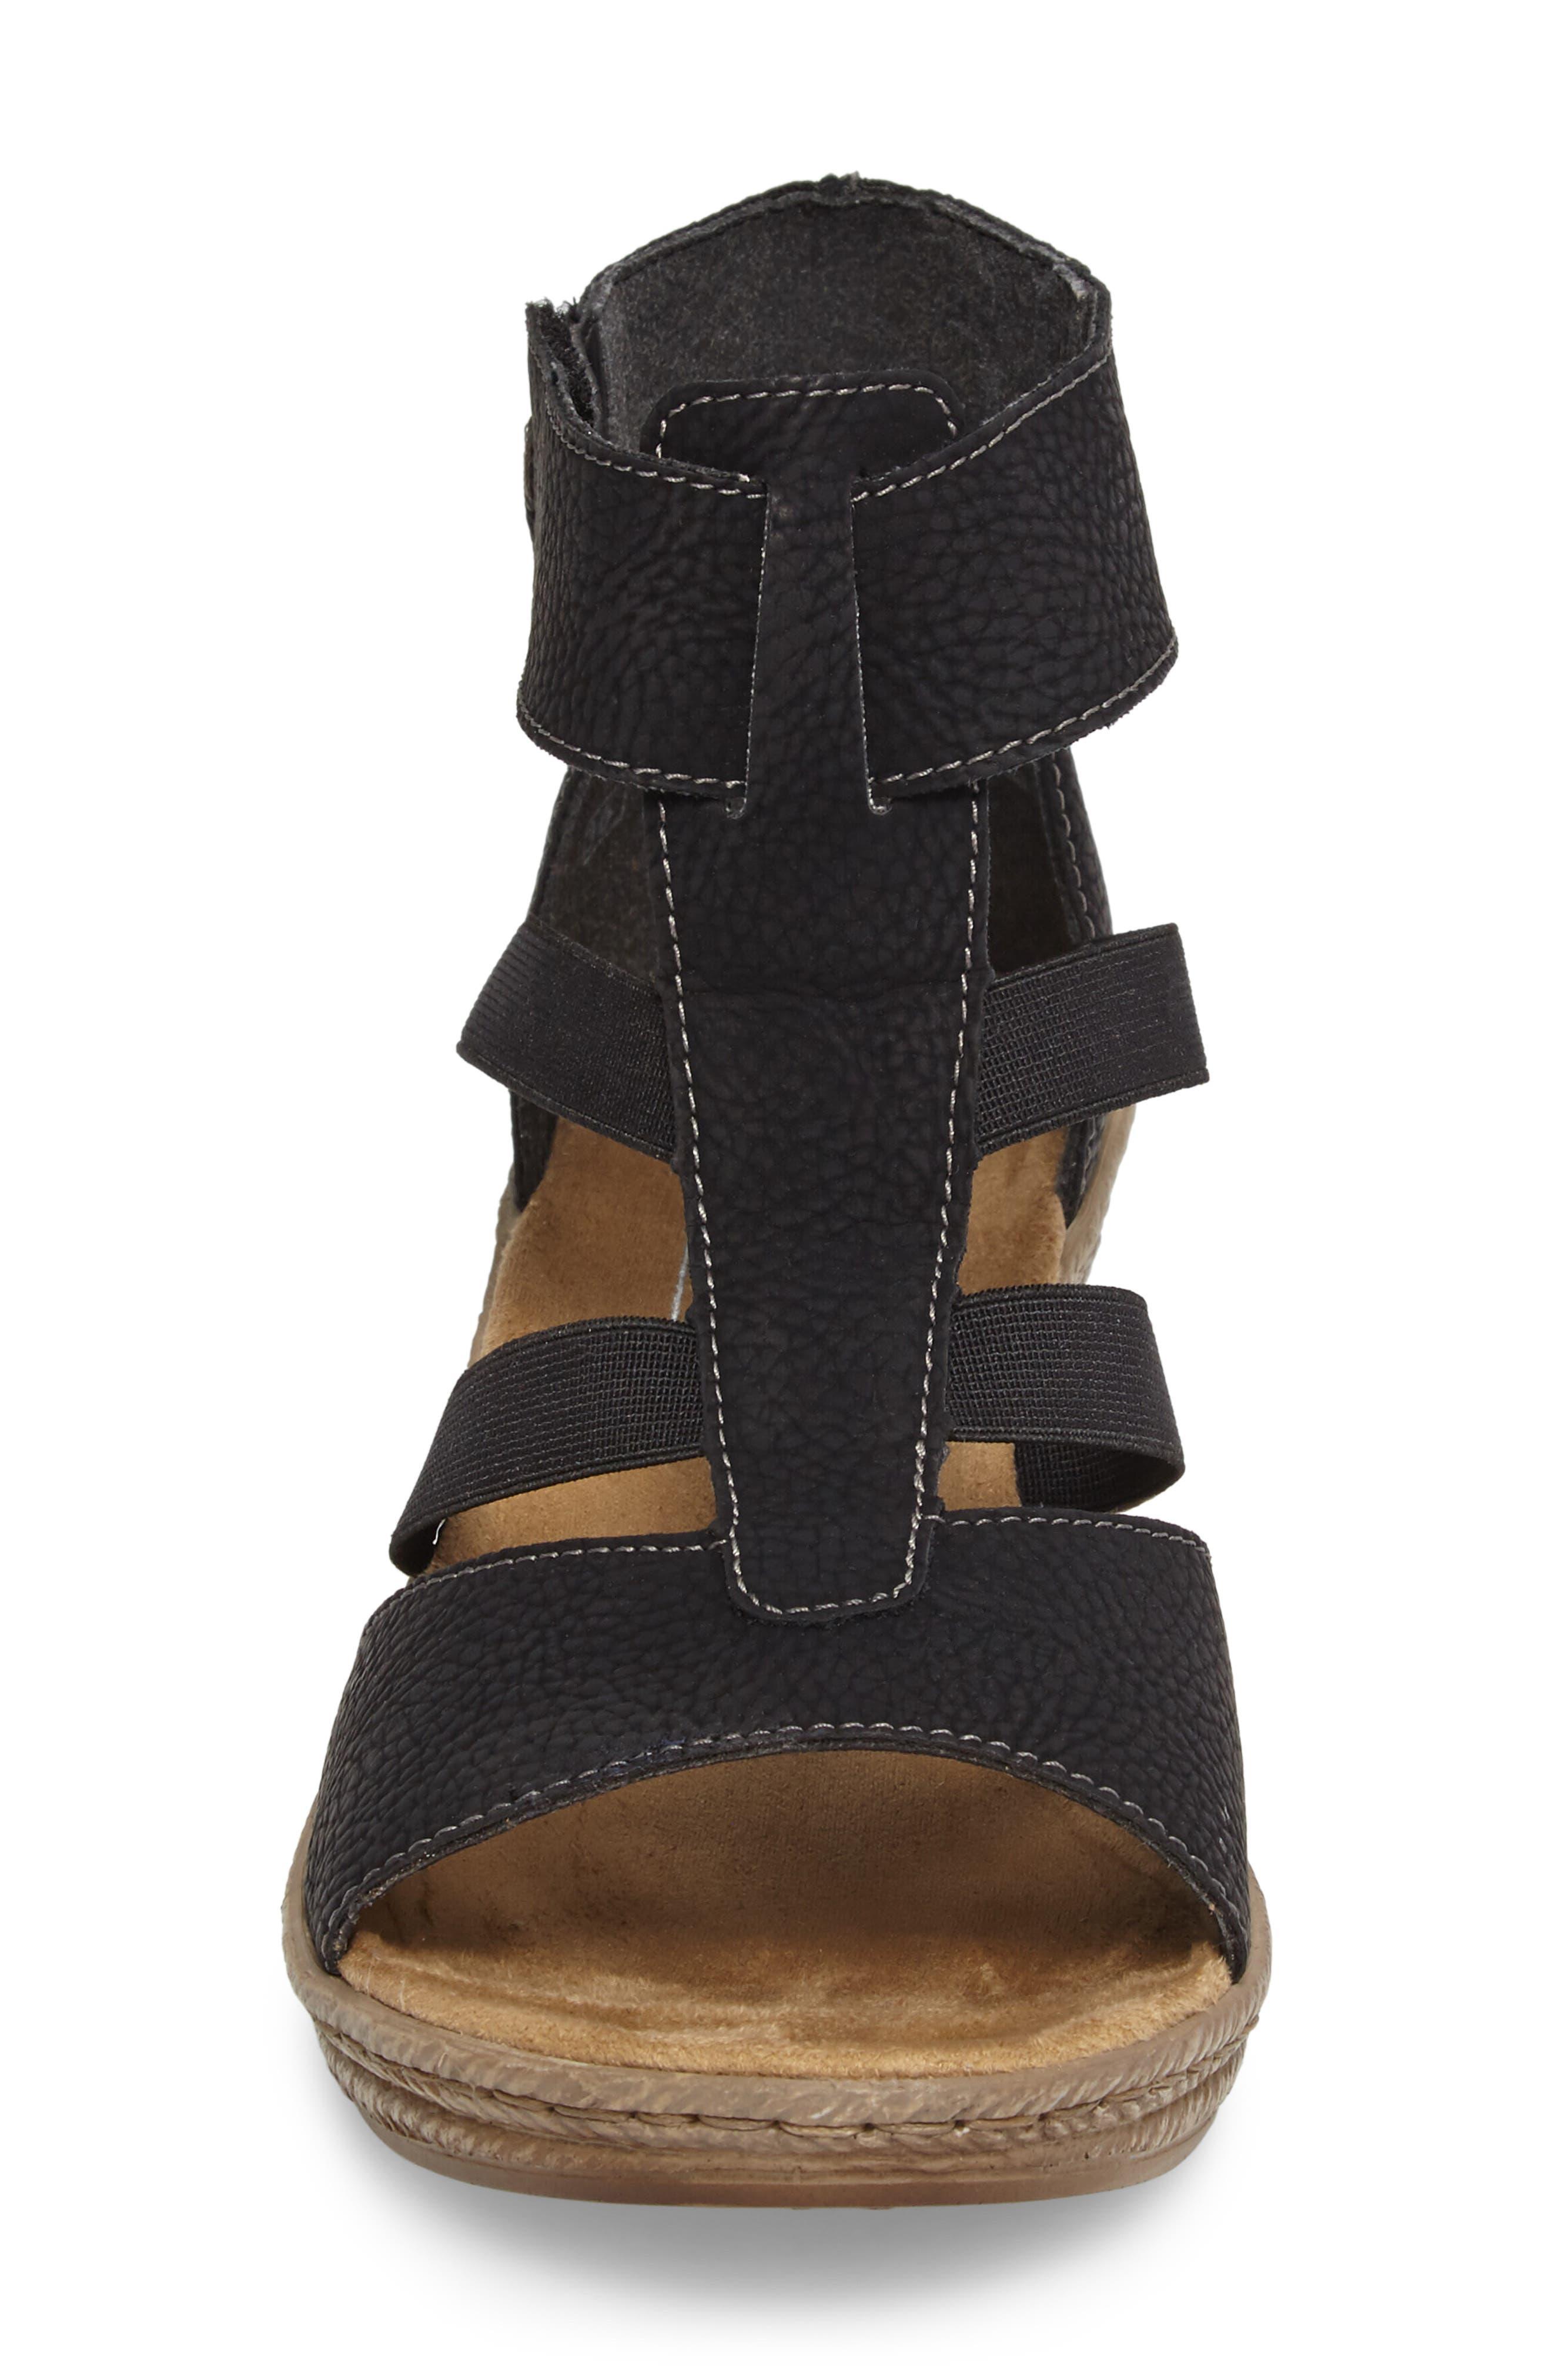 Alternate Image 4  - Rieker Antistress Fanni 39 Wedge Sandal (Women)